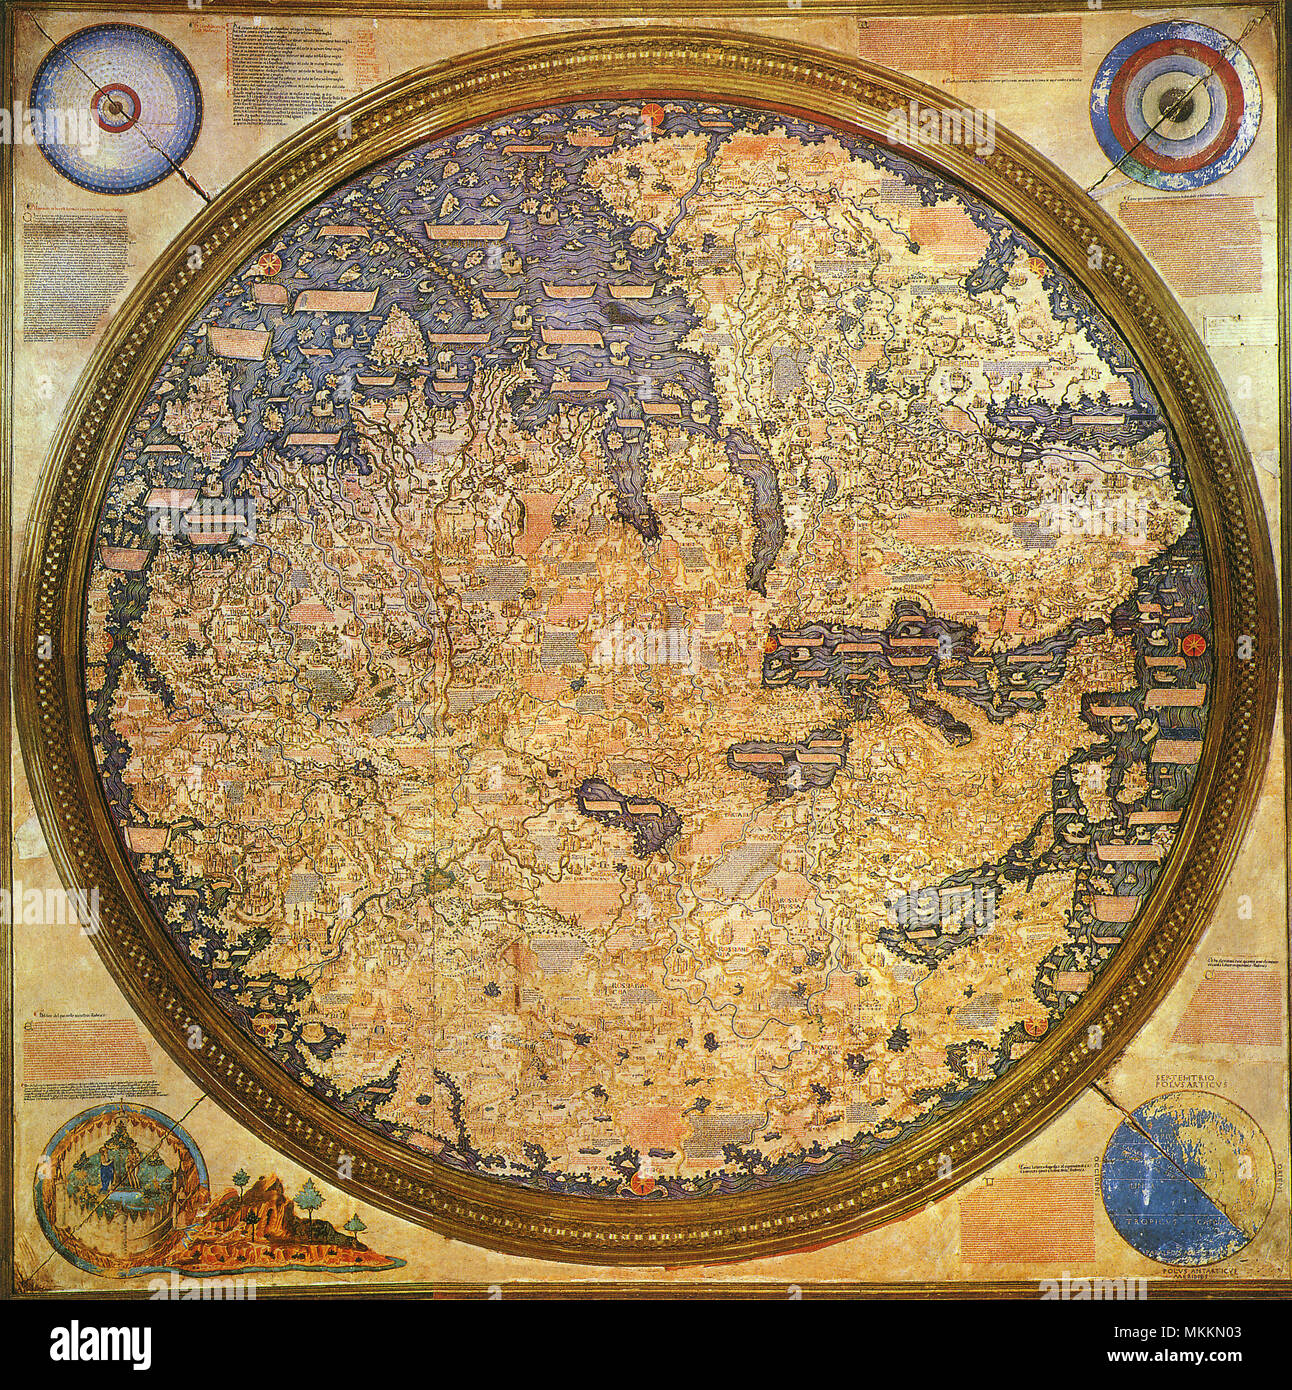 Islamic World Map Stock Photos & Islamic World Map Stock Images - Alamy